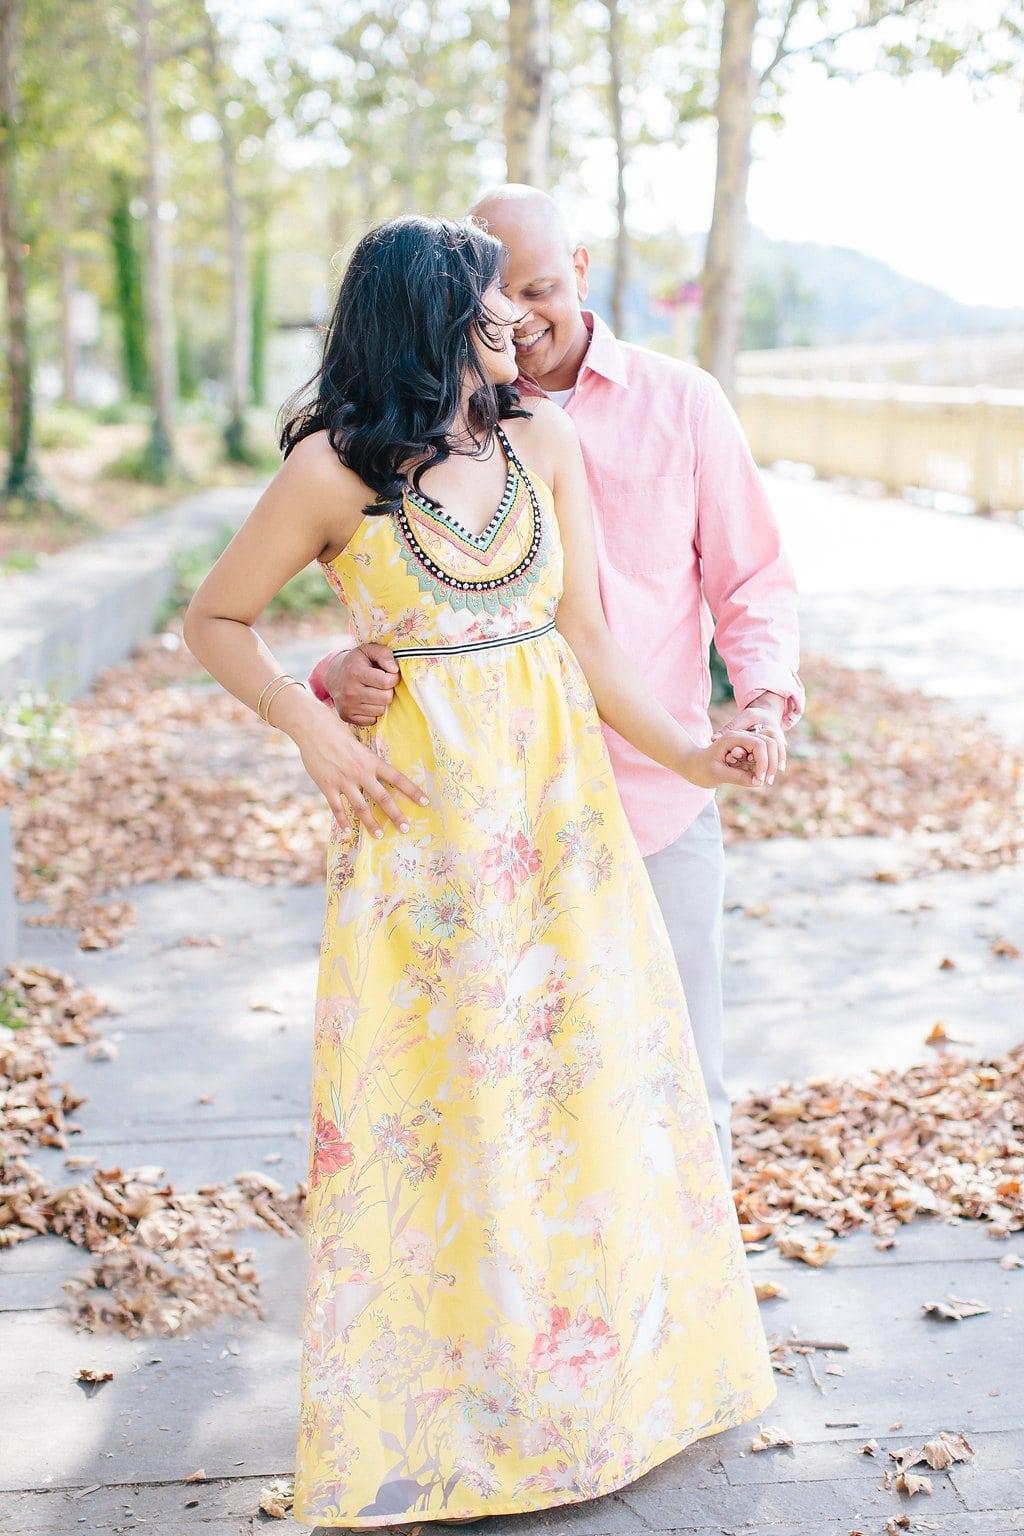 Couples dancing in leaves